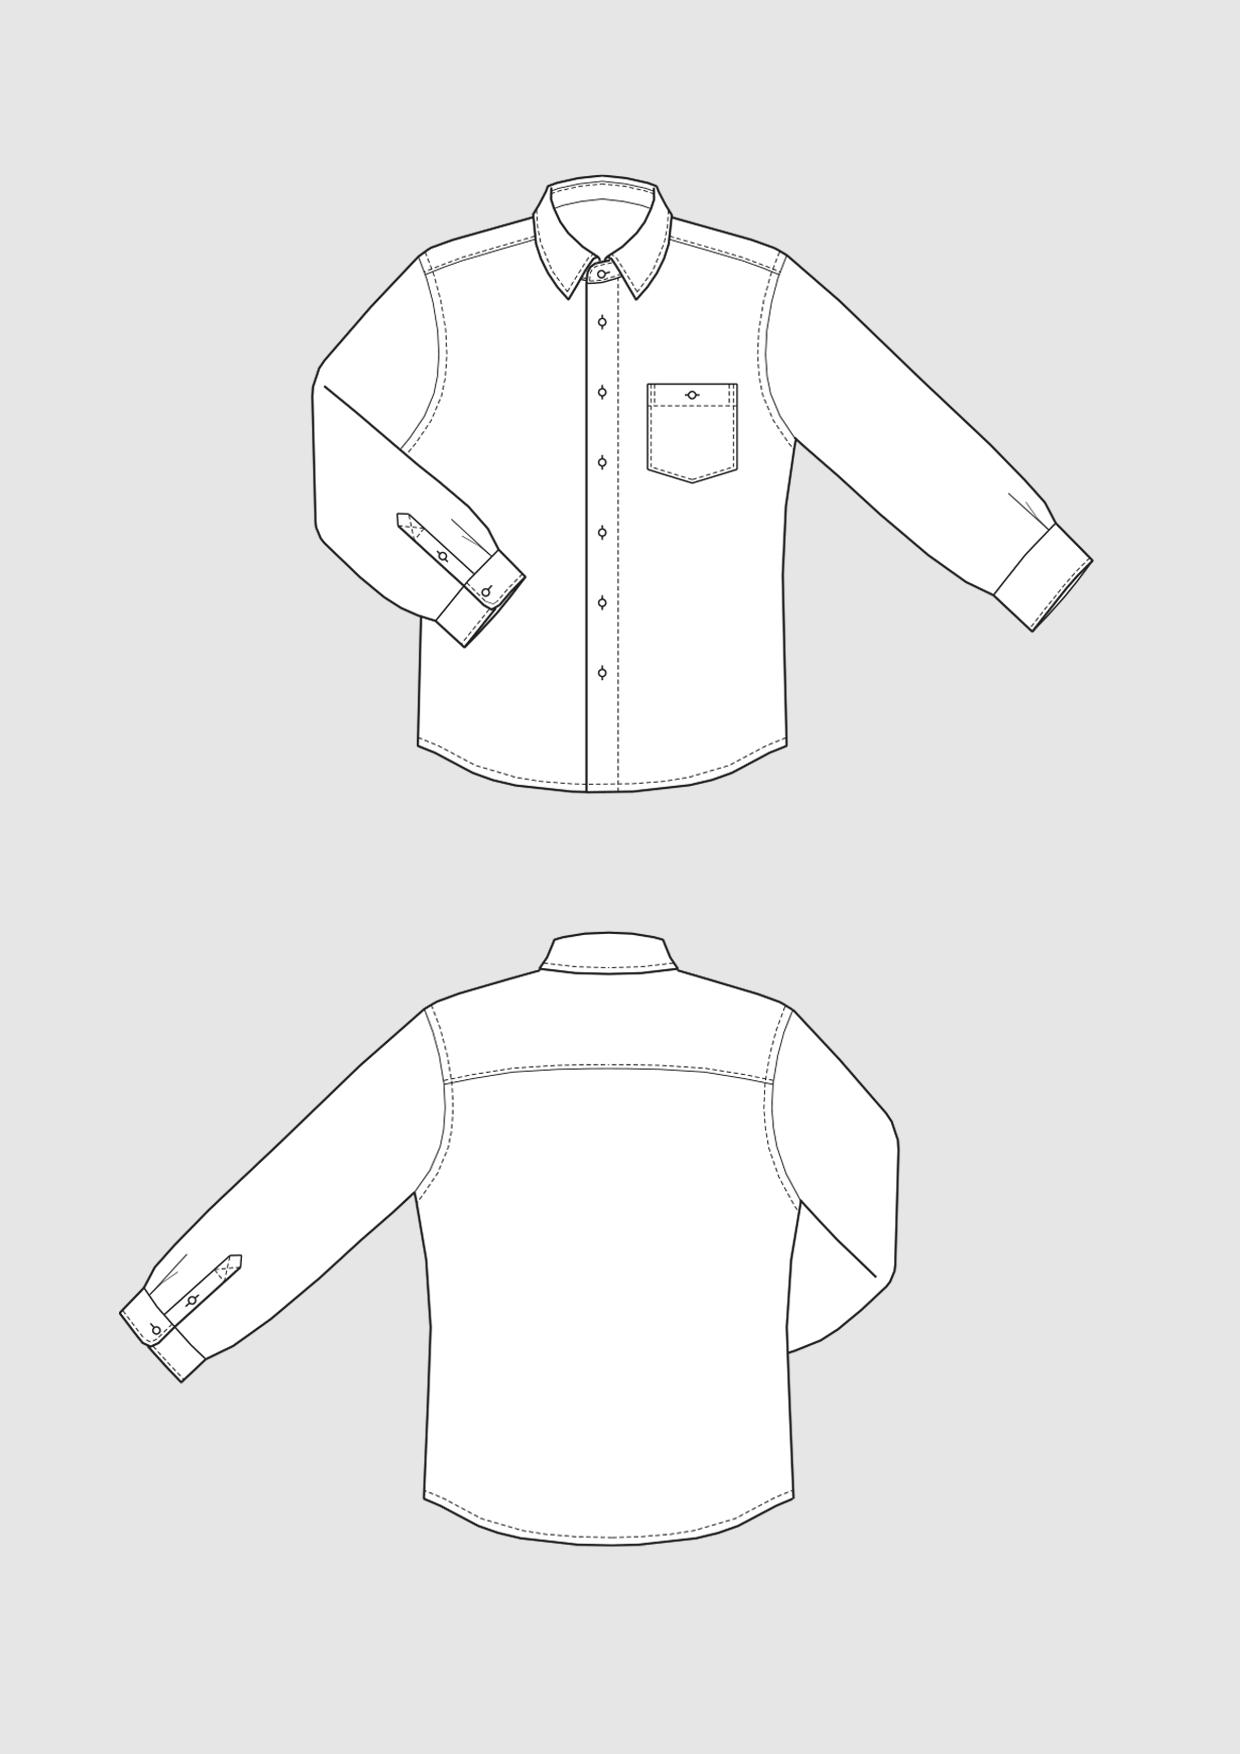 Produkt: Schnittmuster Regular Fit Hemd für Herren